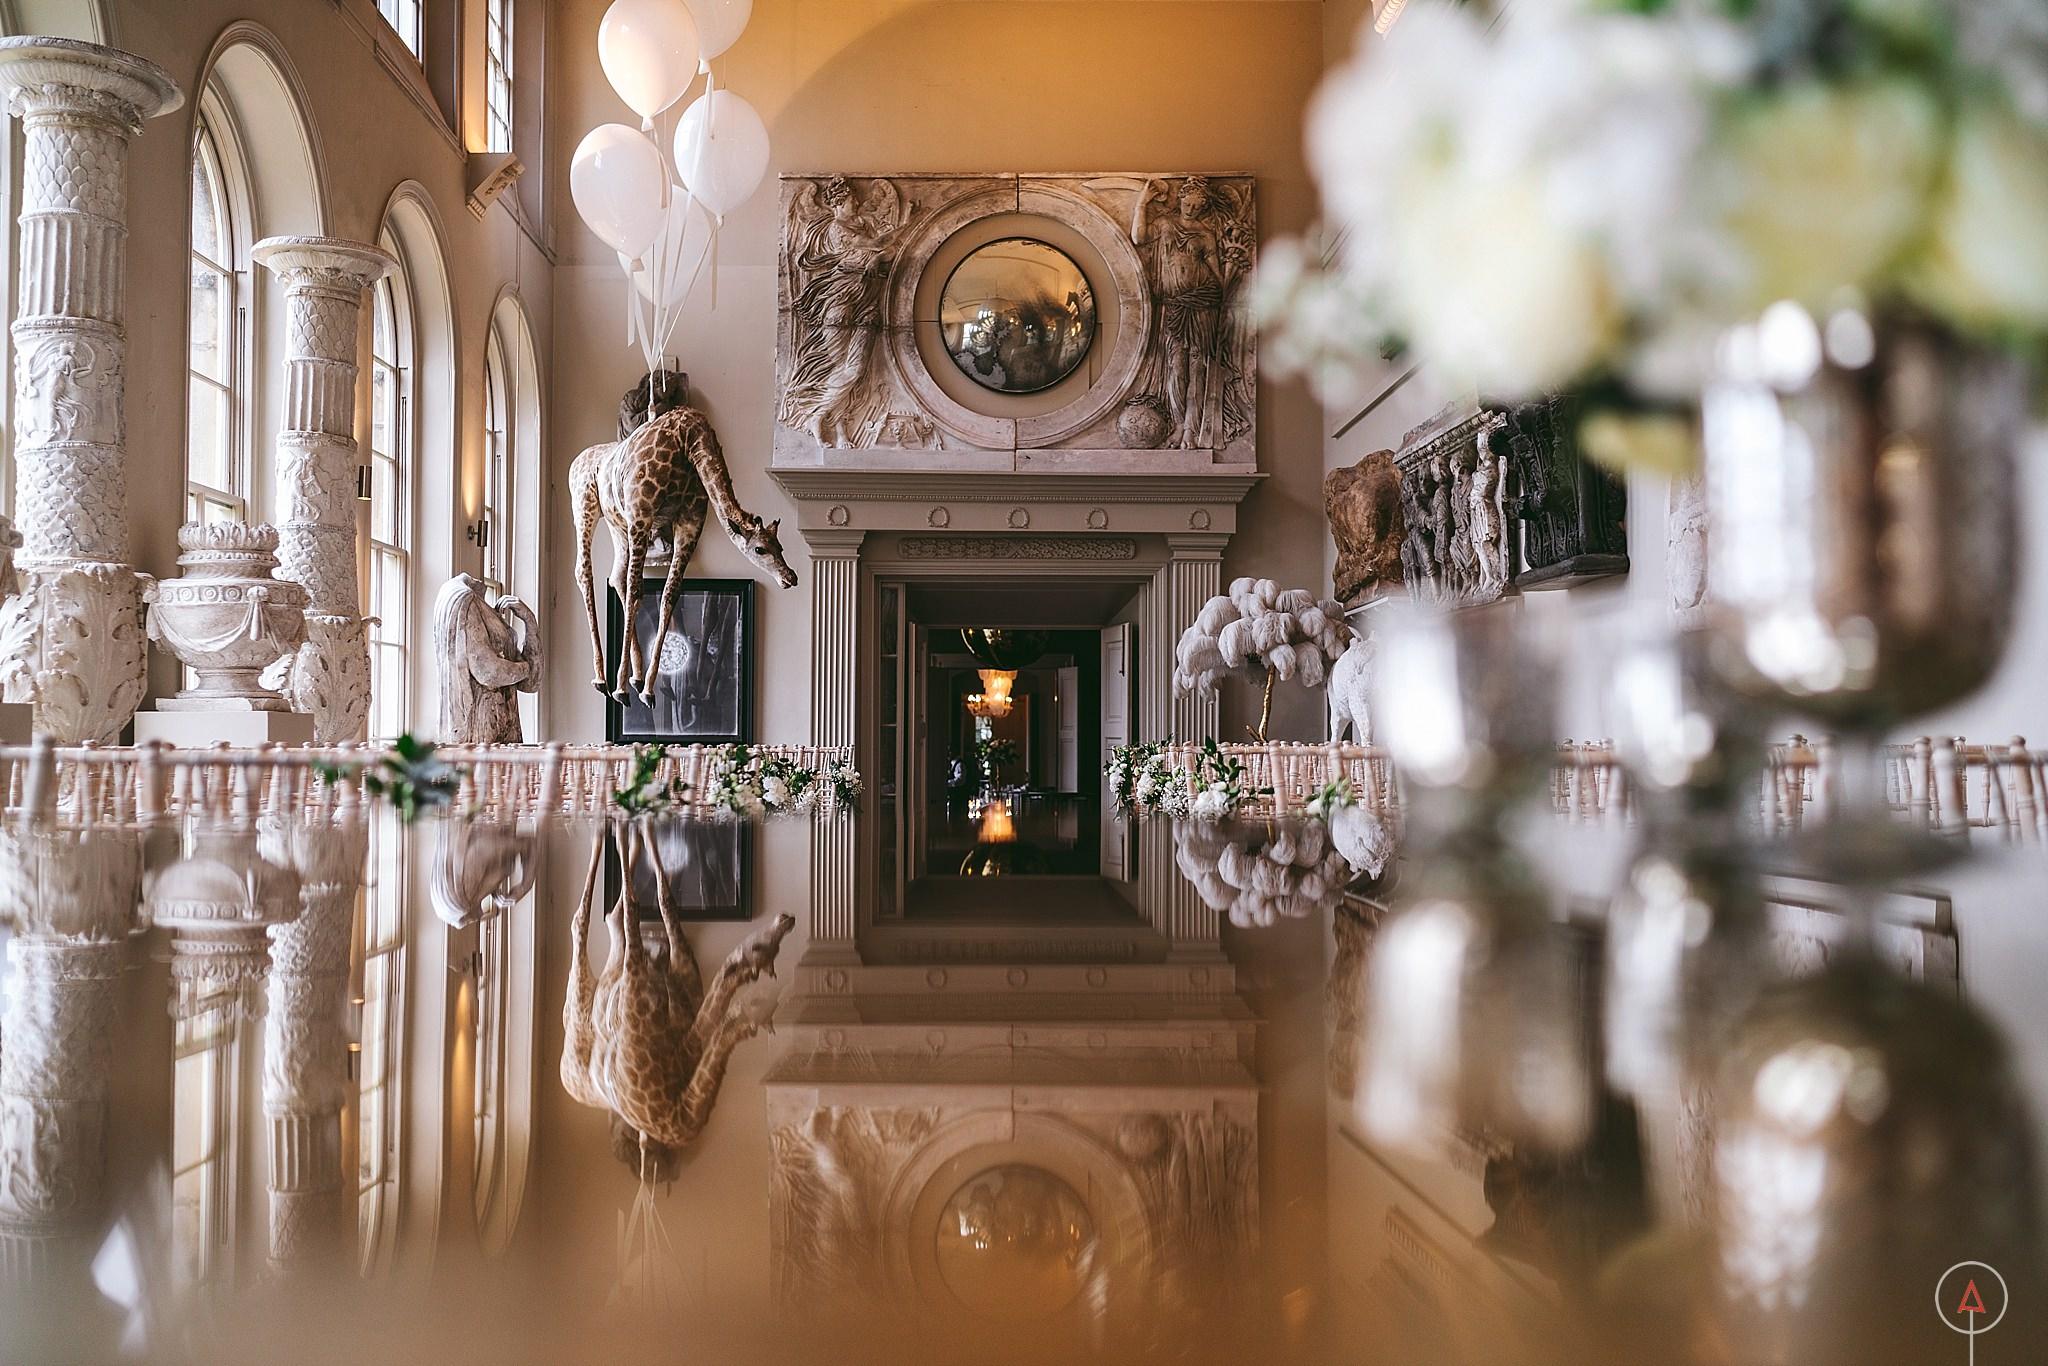 cardiff-wedding-photographer-aga-tomaszek_0209